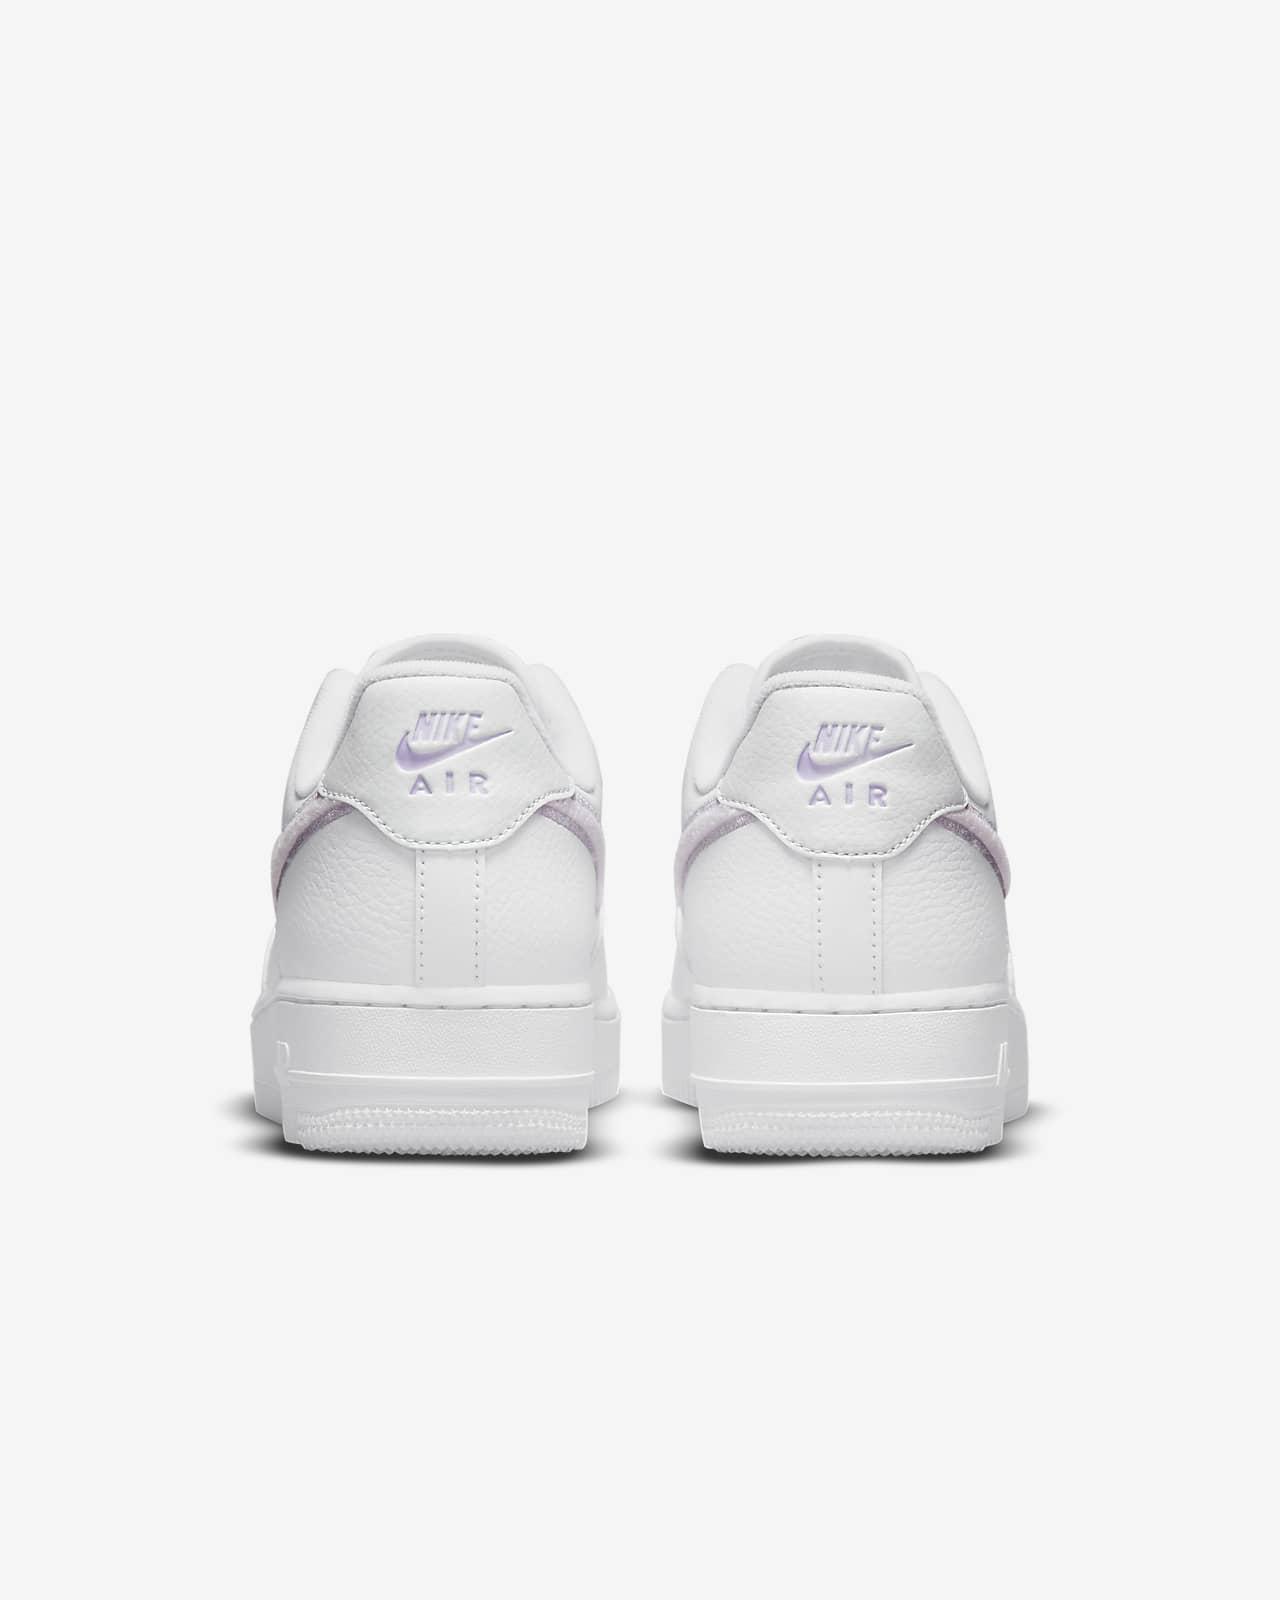 Chaussure Nike Air Force 1 '07 Essential pour Femme. Nike LU